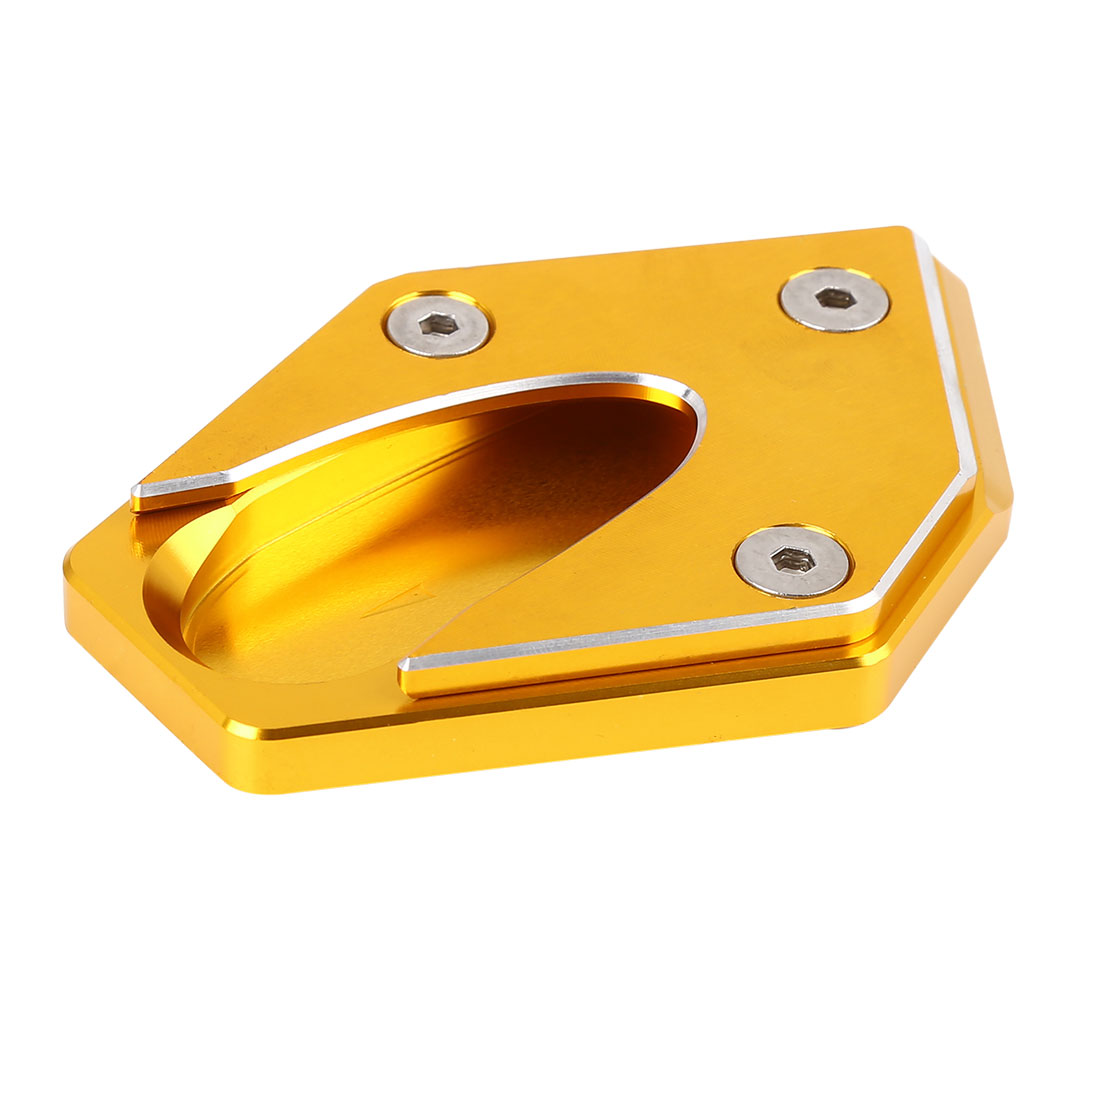 Gold Tone Aluminium Alloy Nonslip Kickstand Enlarger for Suzuki GSX250 GSX250R